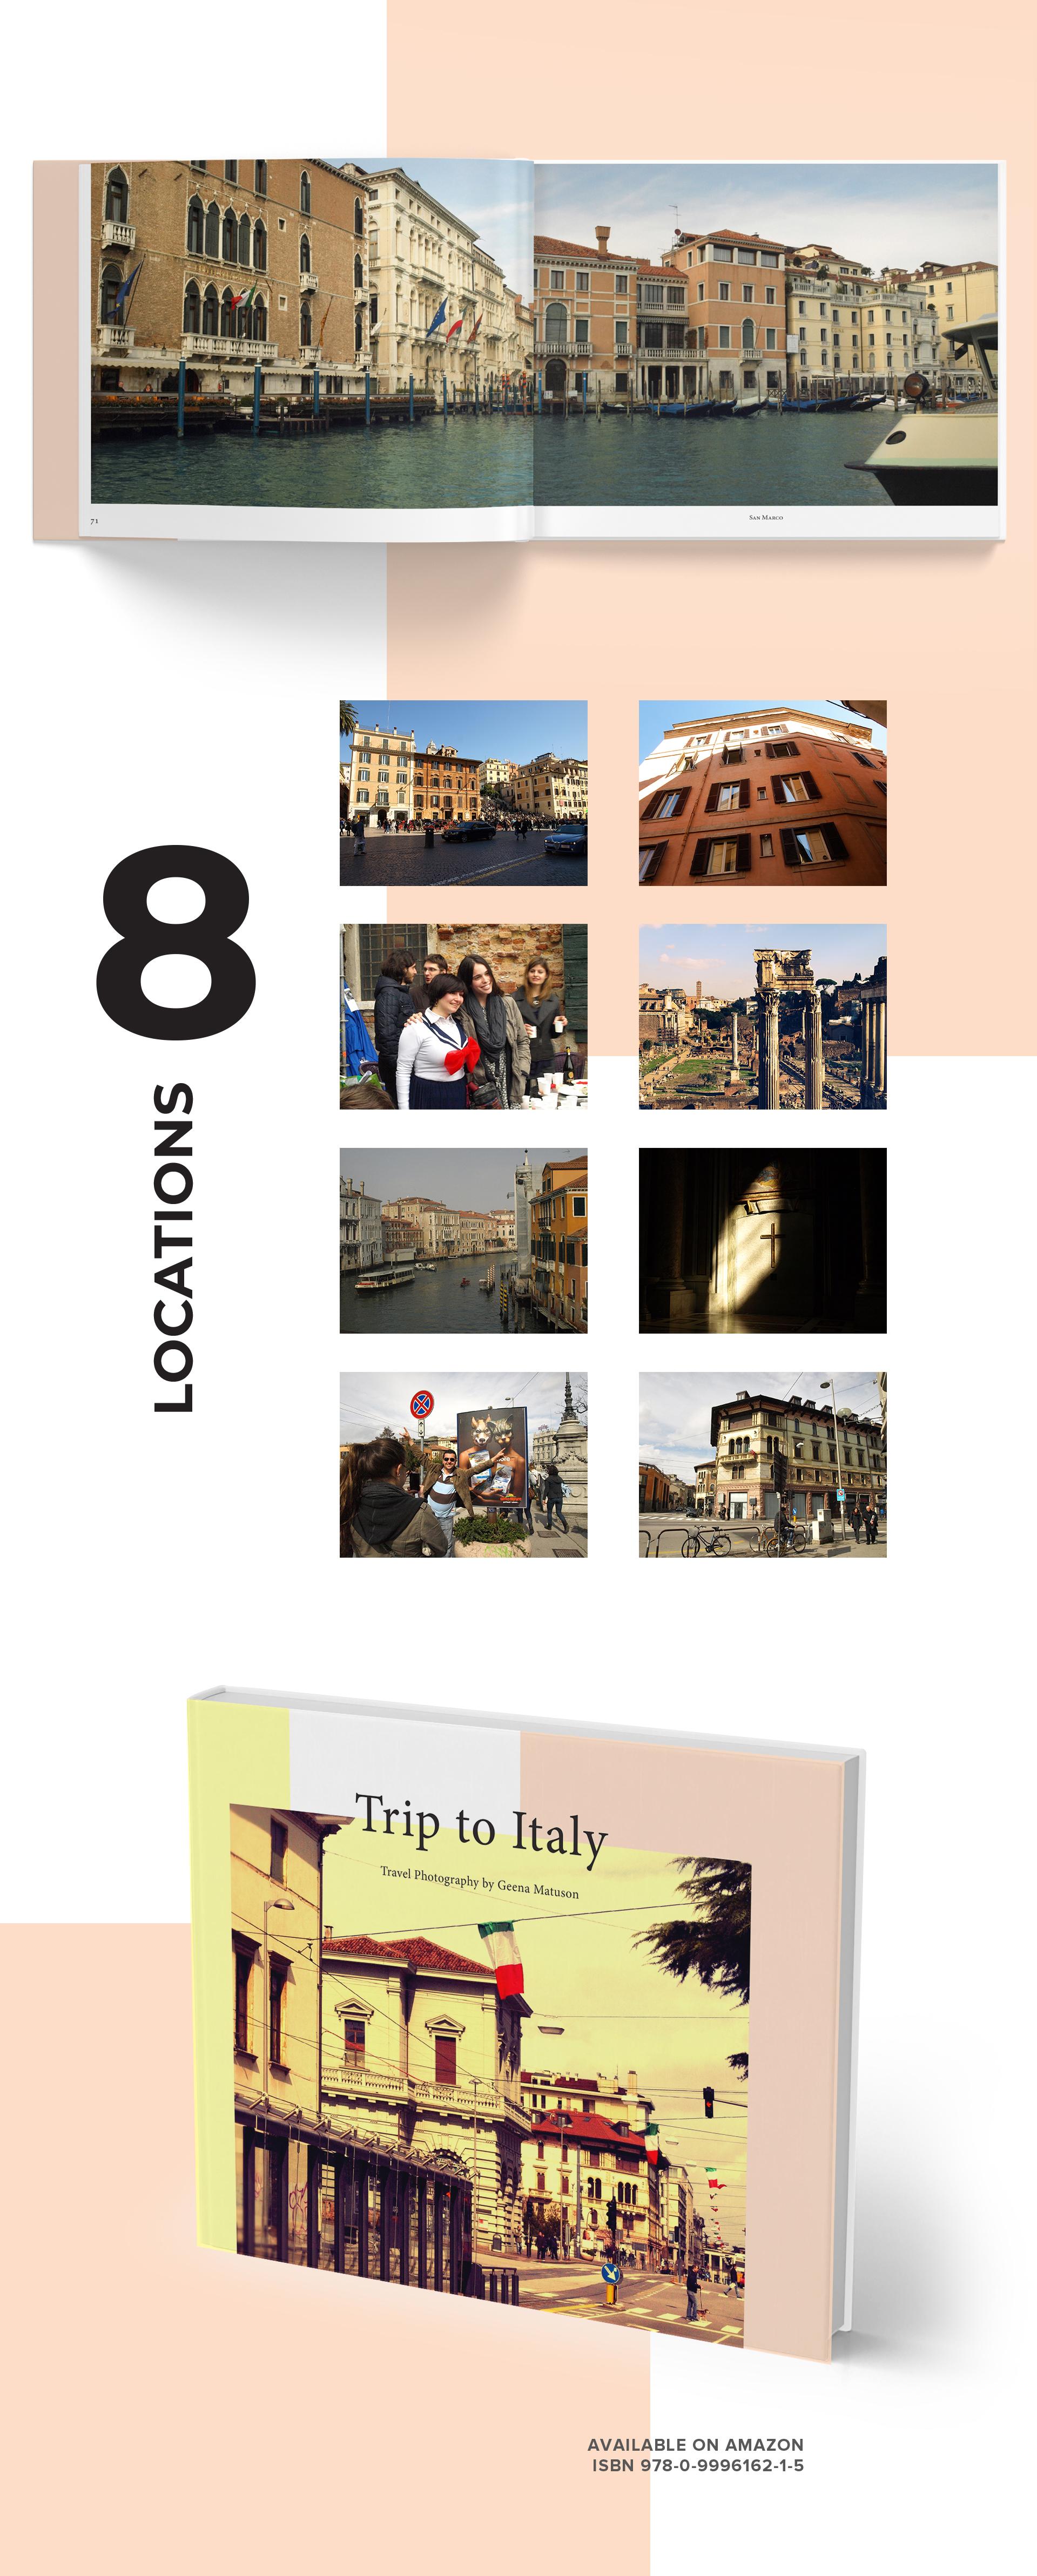 GeenaMatuson_TheGirlMirage_Trip-to-Italy_Book_05.jpg